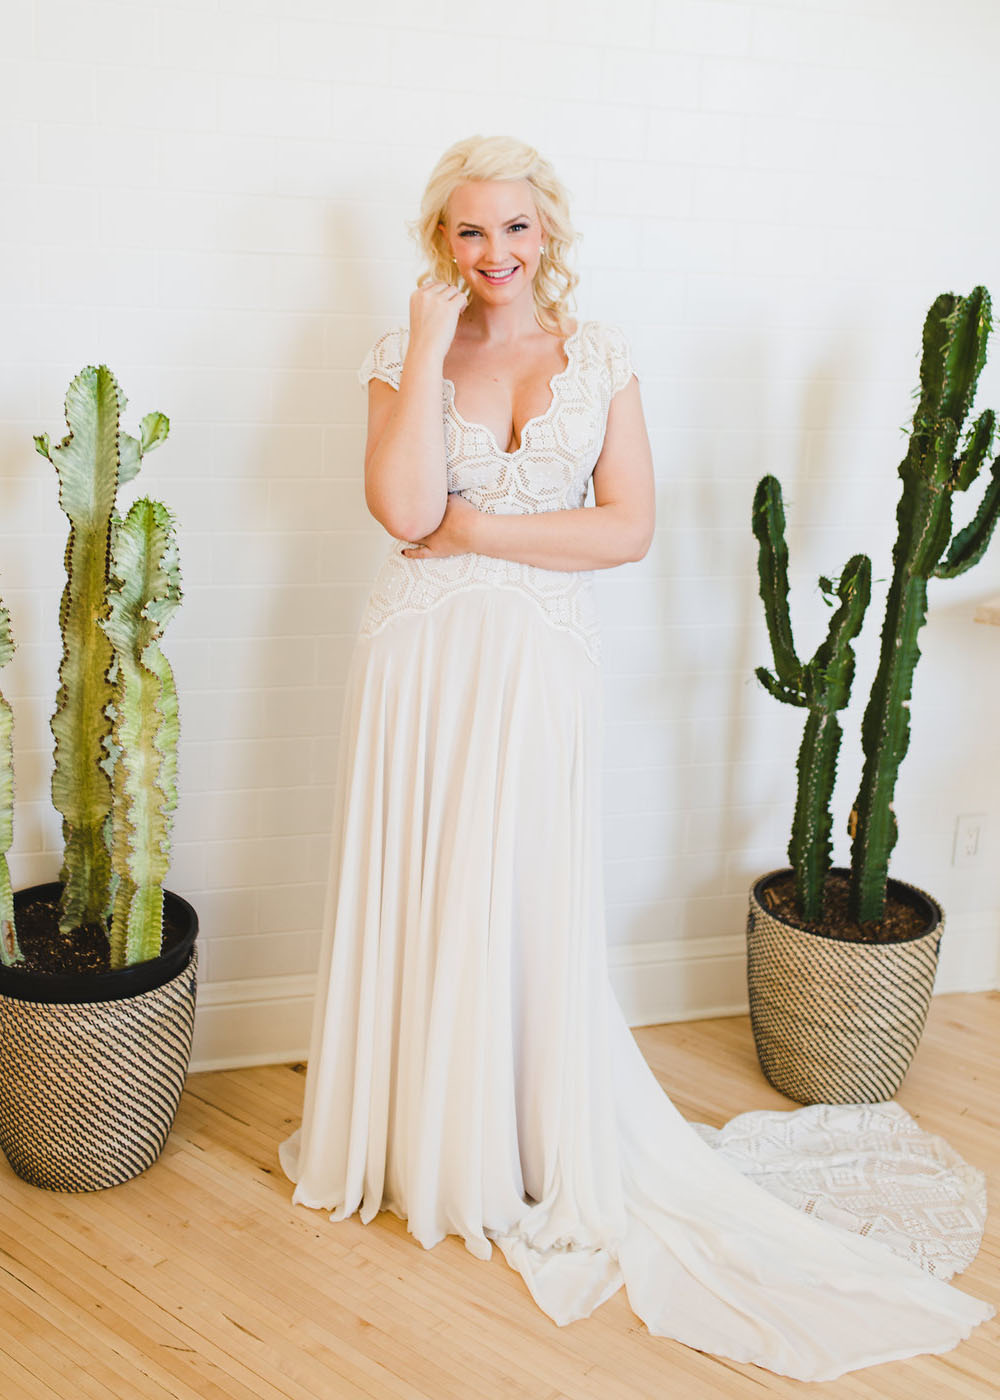 12 Foto Anna Boardman Photography - Vestidos de Noiva Boho plus size